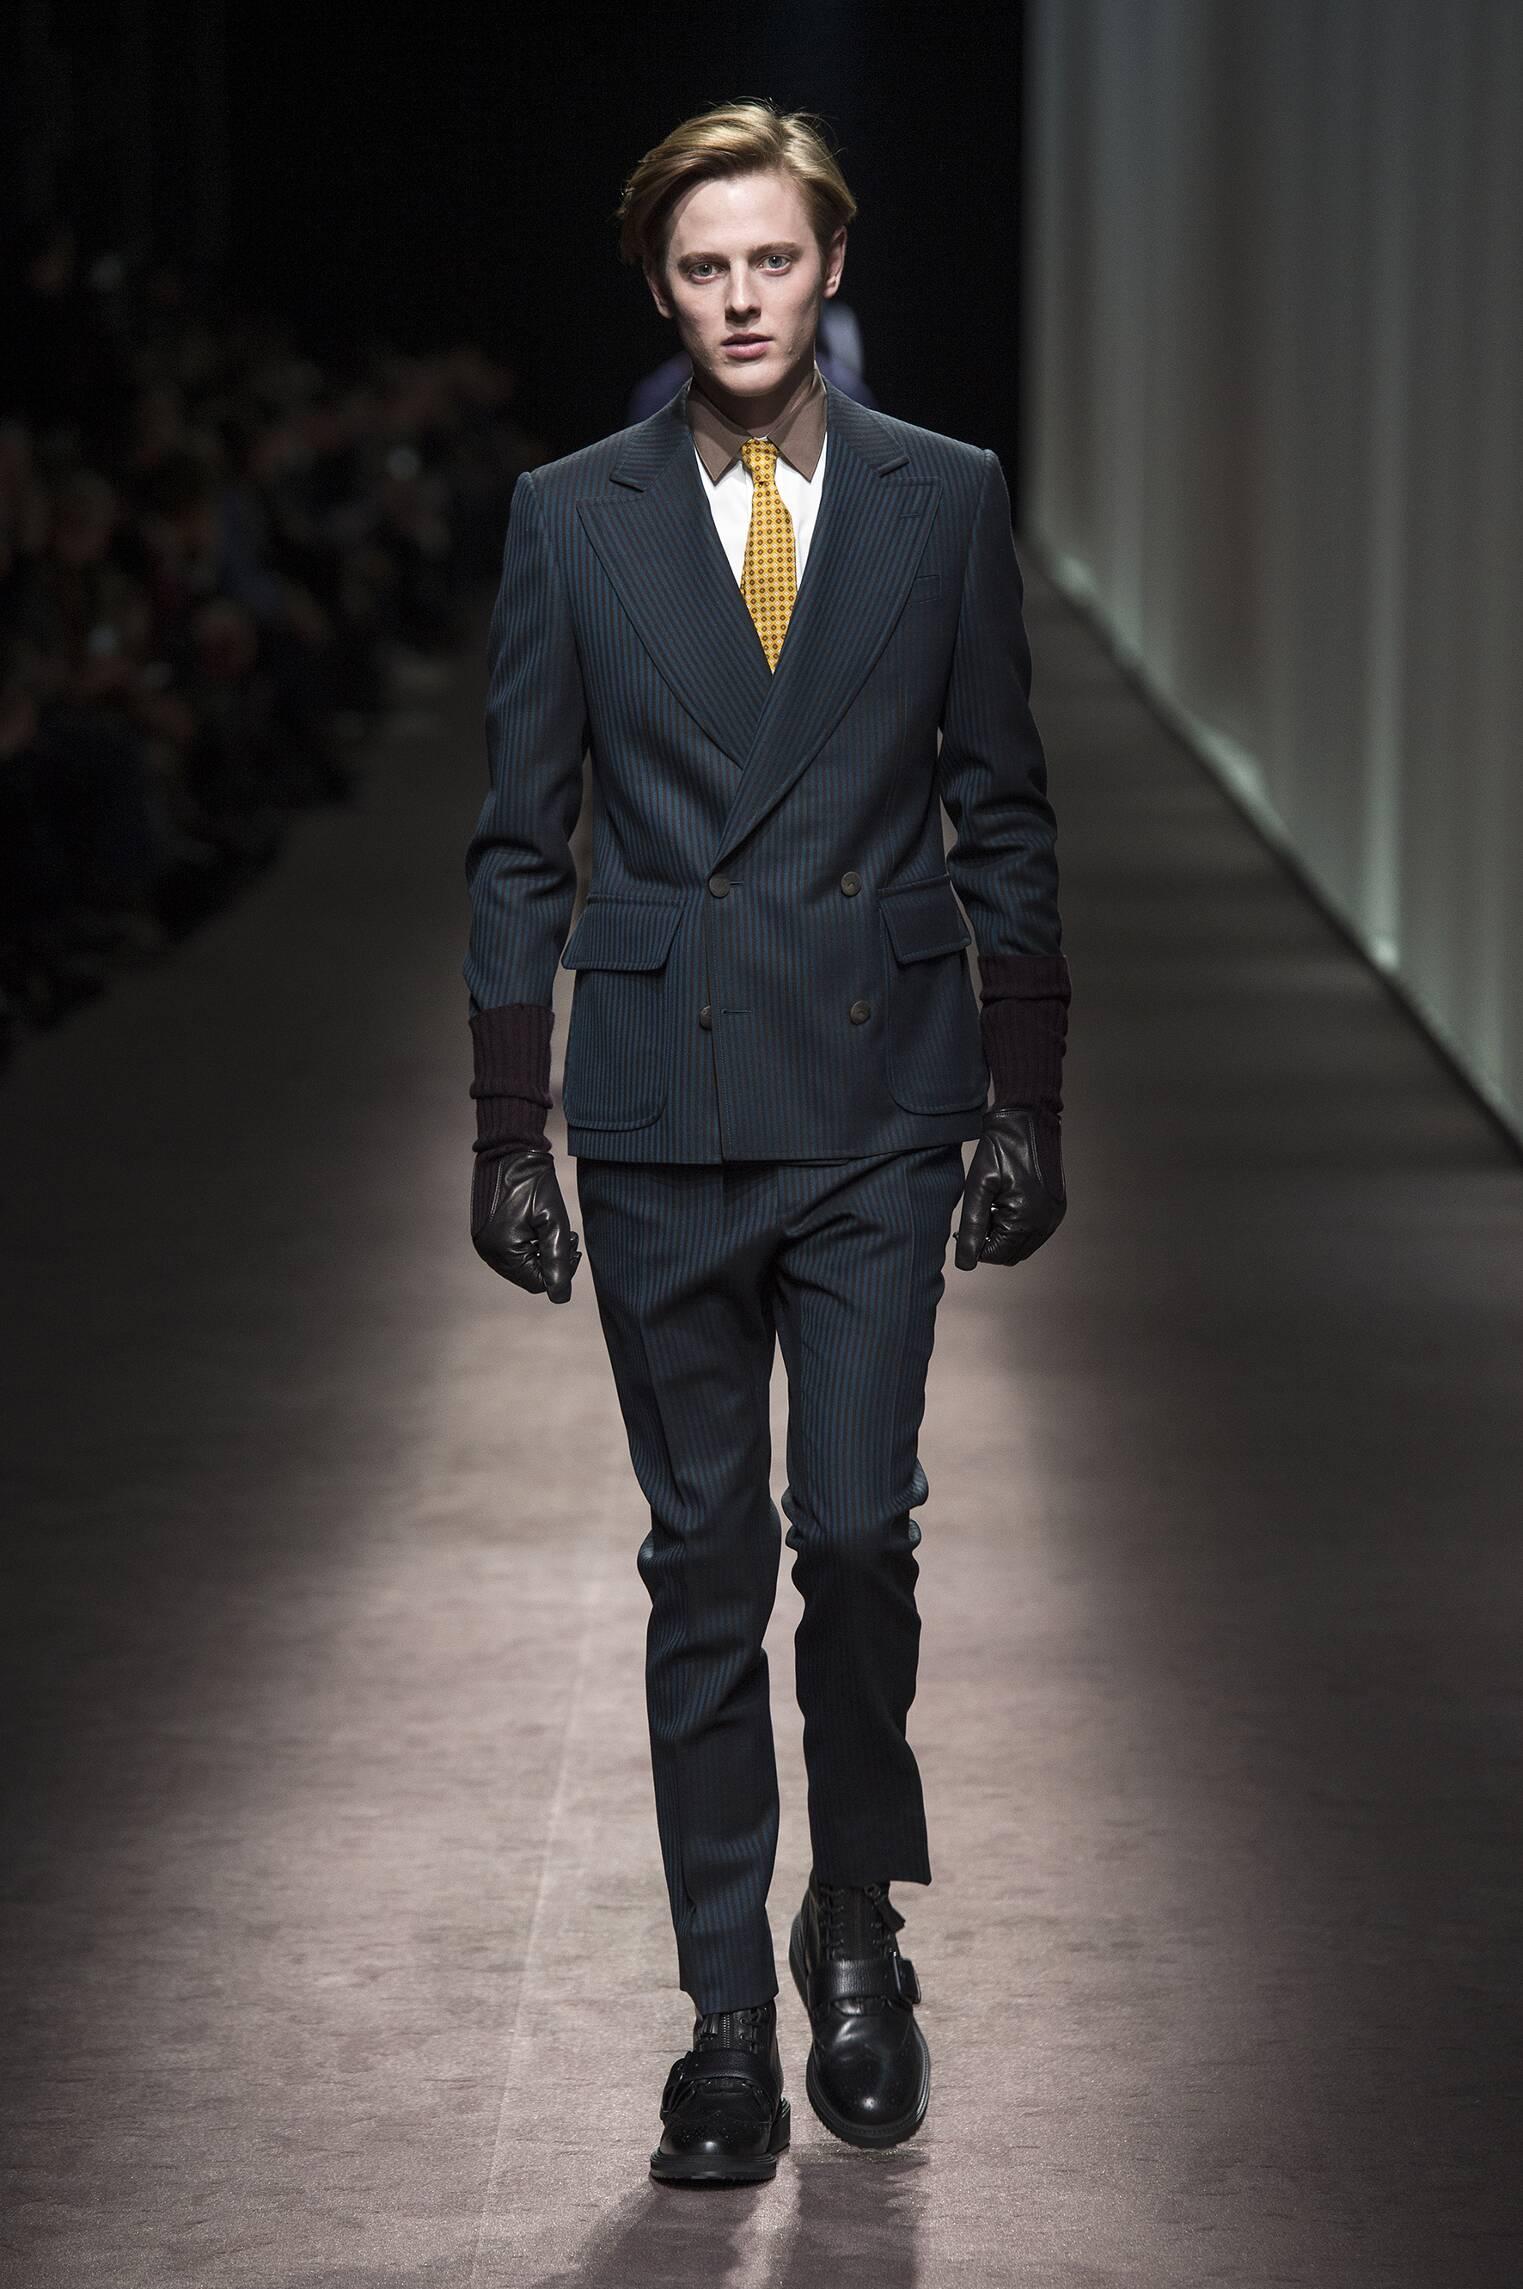 Canali Milan Fashion Week Menswear